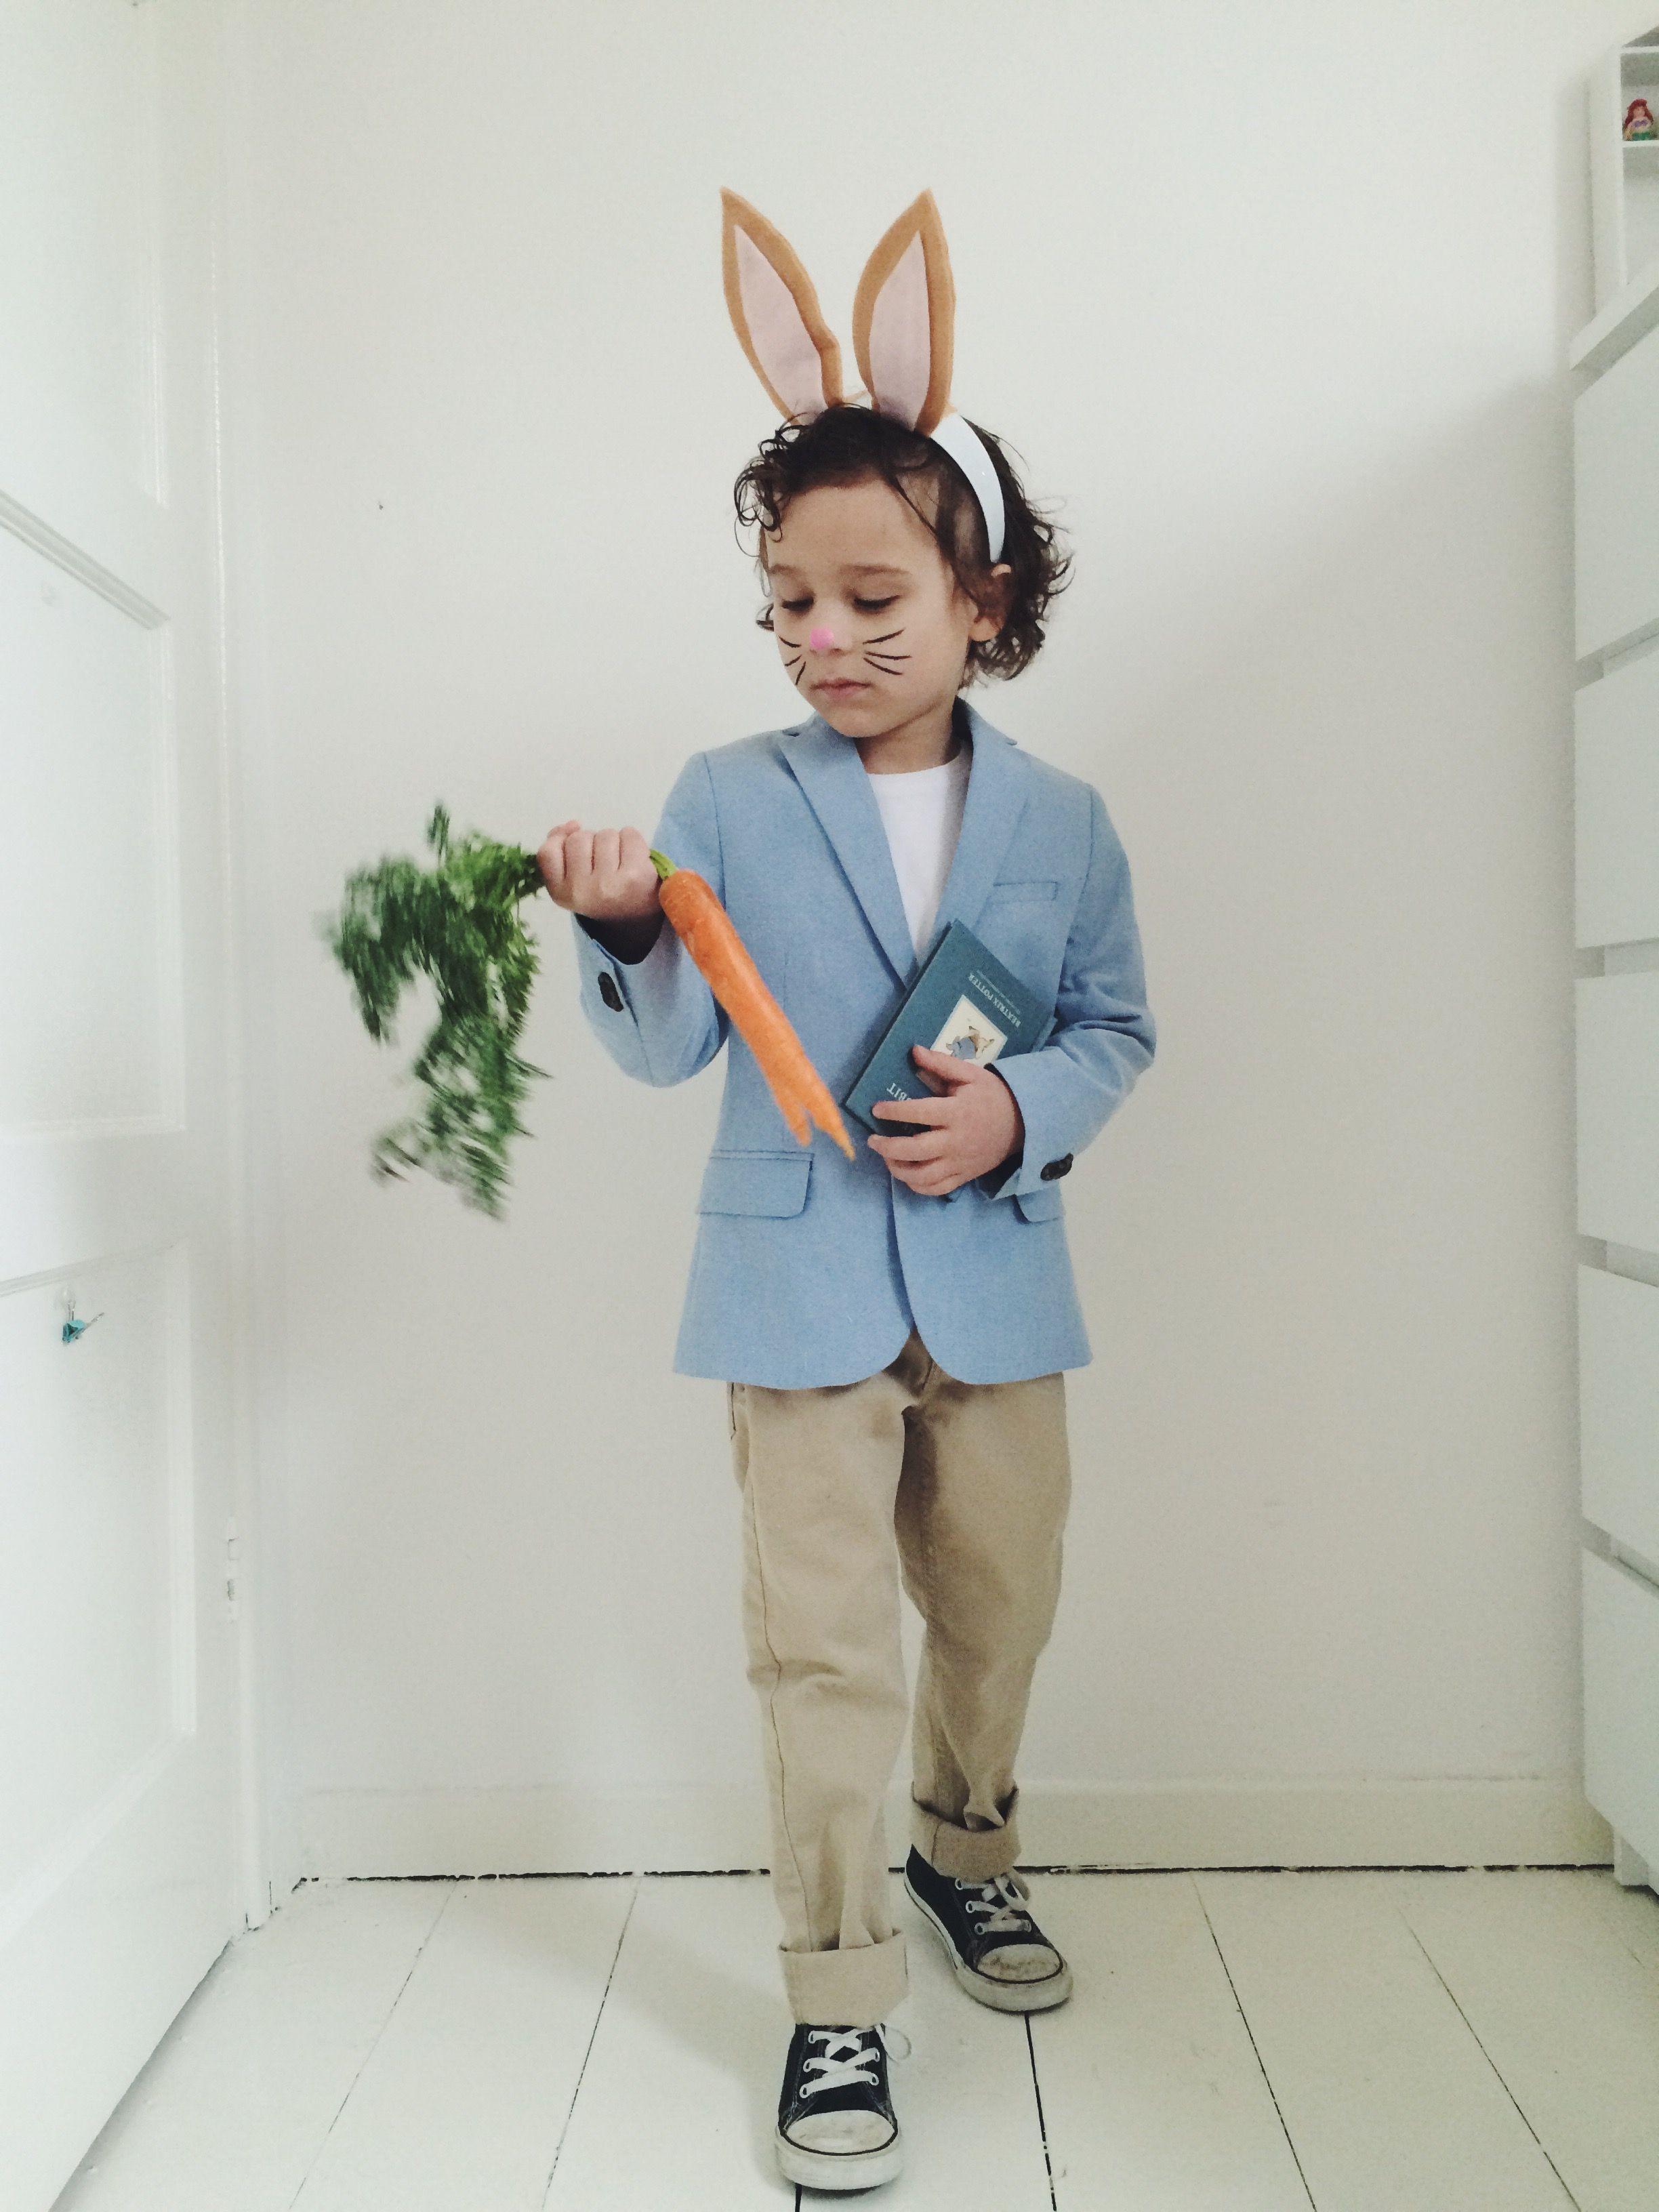 634562a37e93 Peter rabbit, costume, world book day, Beatrix Potter   GW in 2019 ...